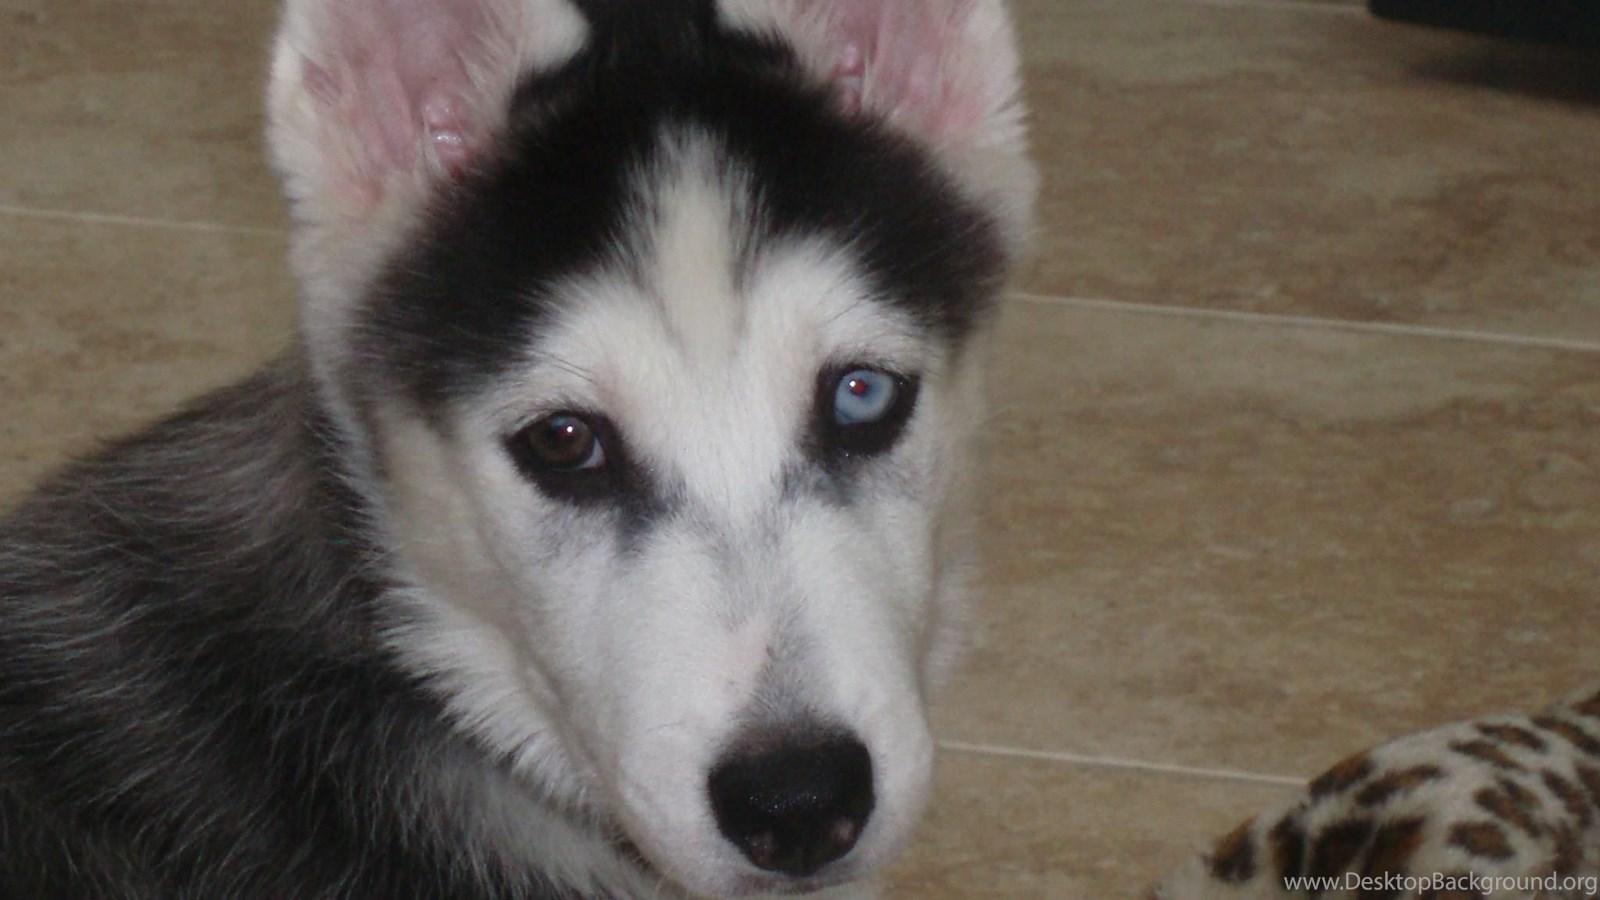 siberian husky puppy hd wallpaper get it now desktop background